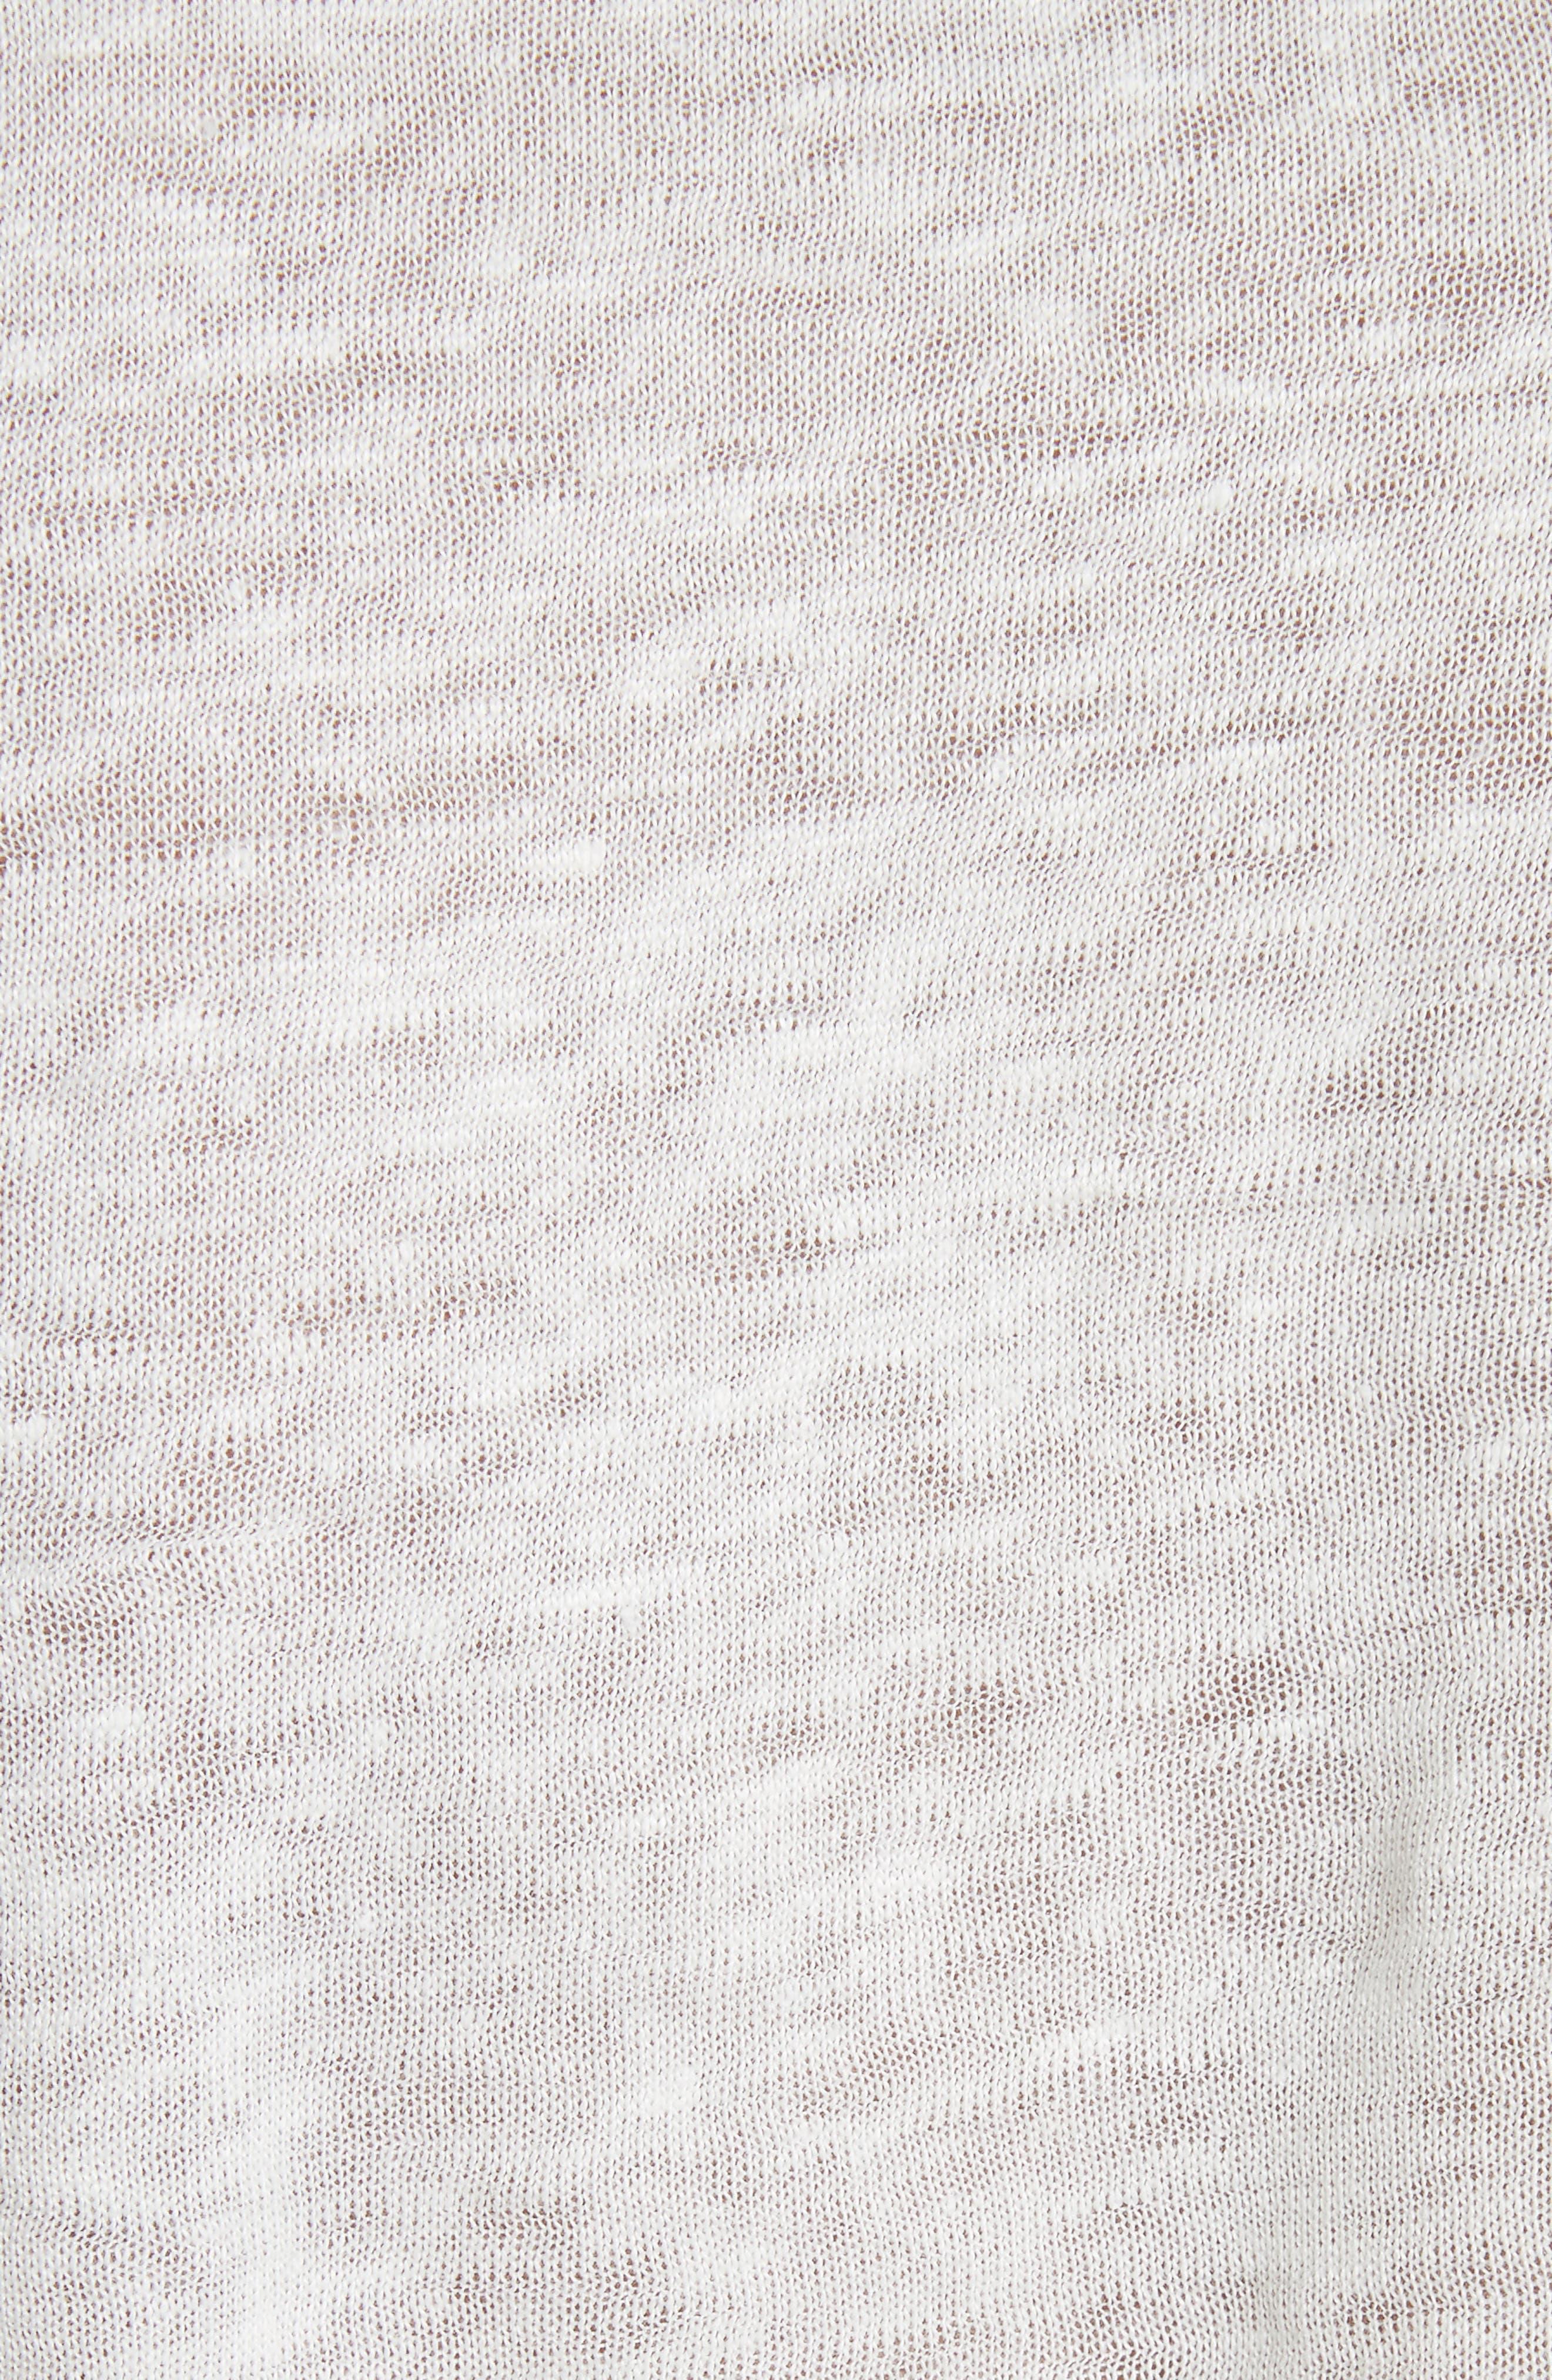 Silk & Linen Tank,                             Alternate thumbnail 5, color,                             Milk